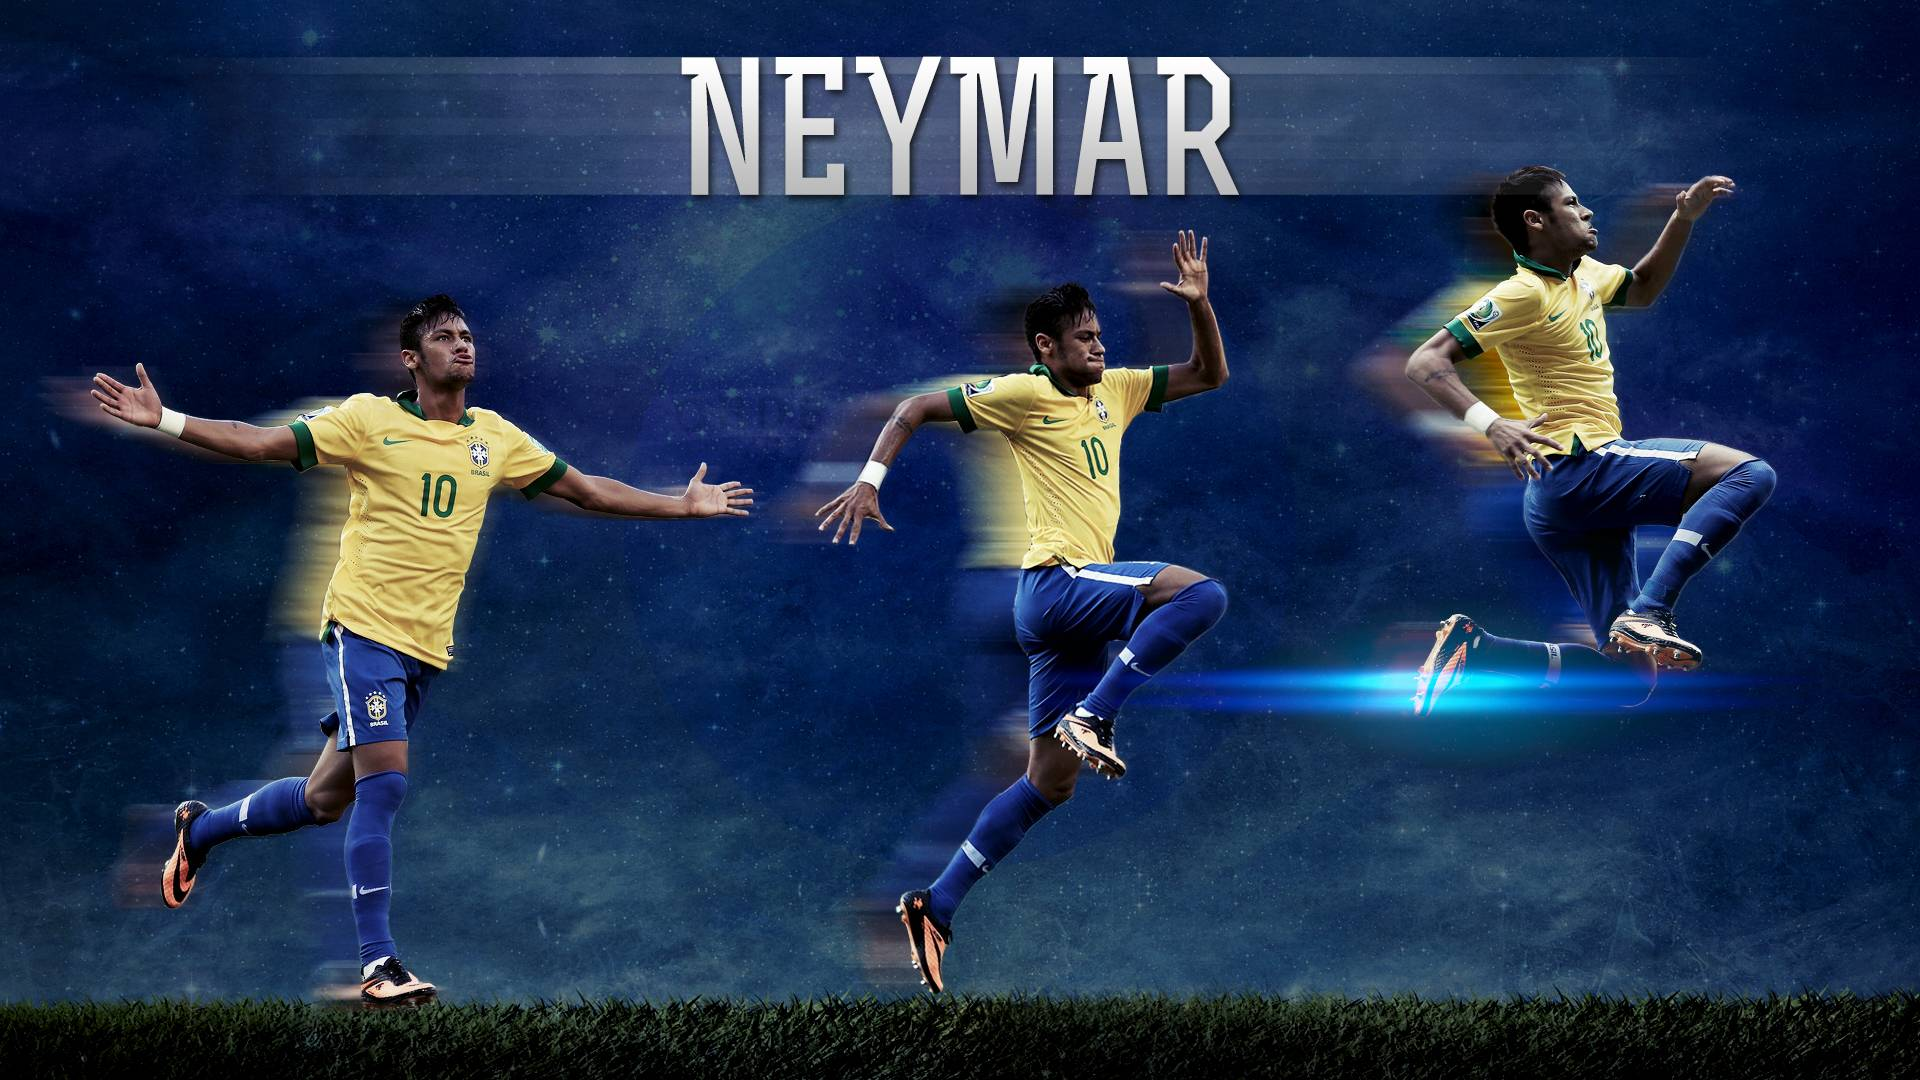 Neymar hd wallpapers 2015 wallpaper cave for Home 2015 wallpaper hd